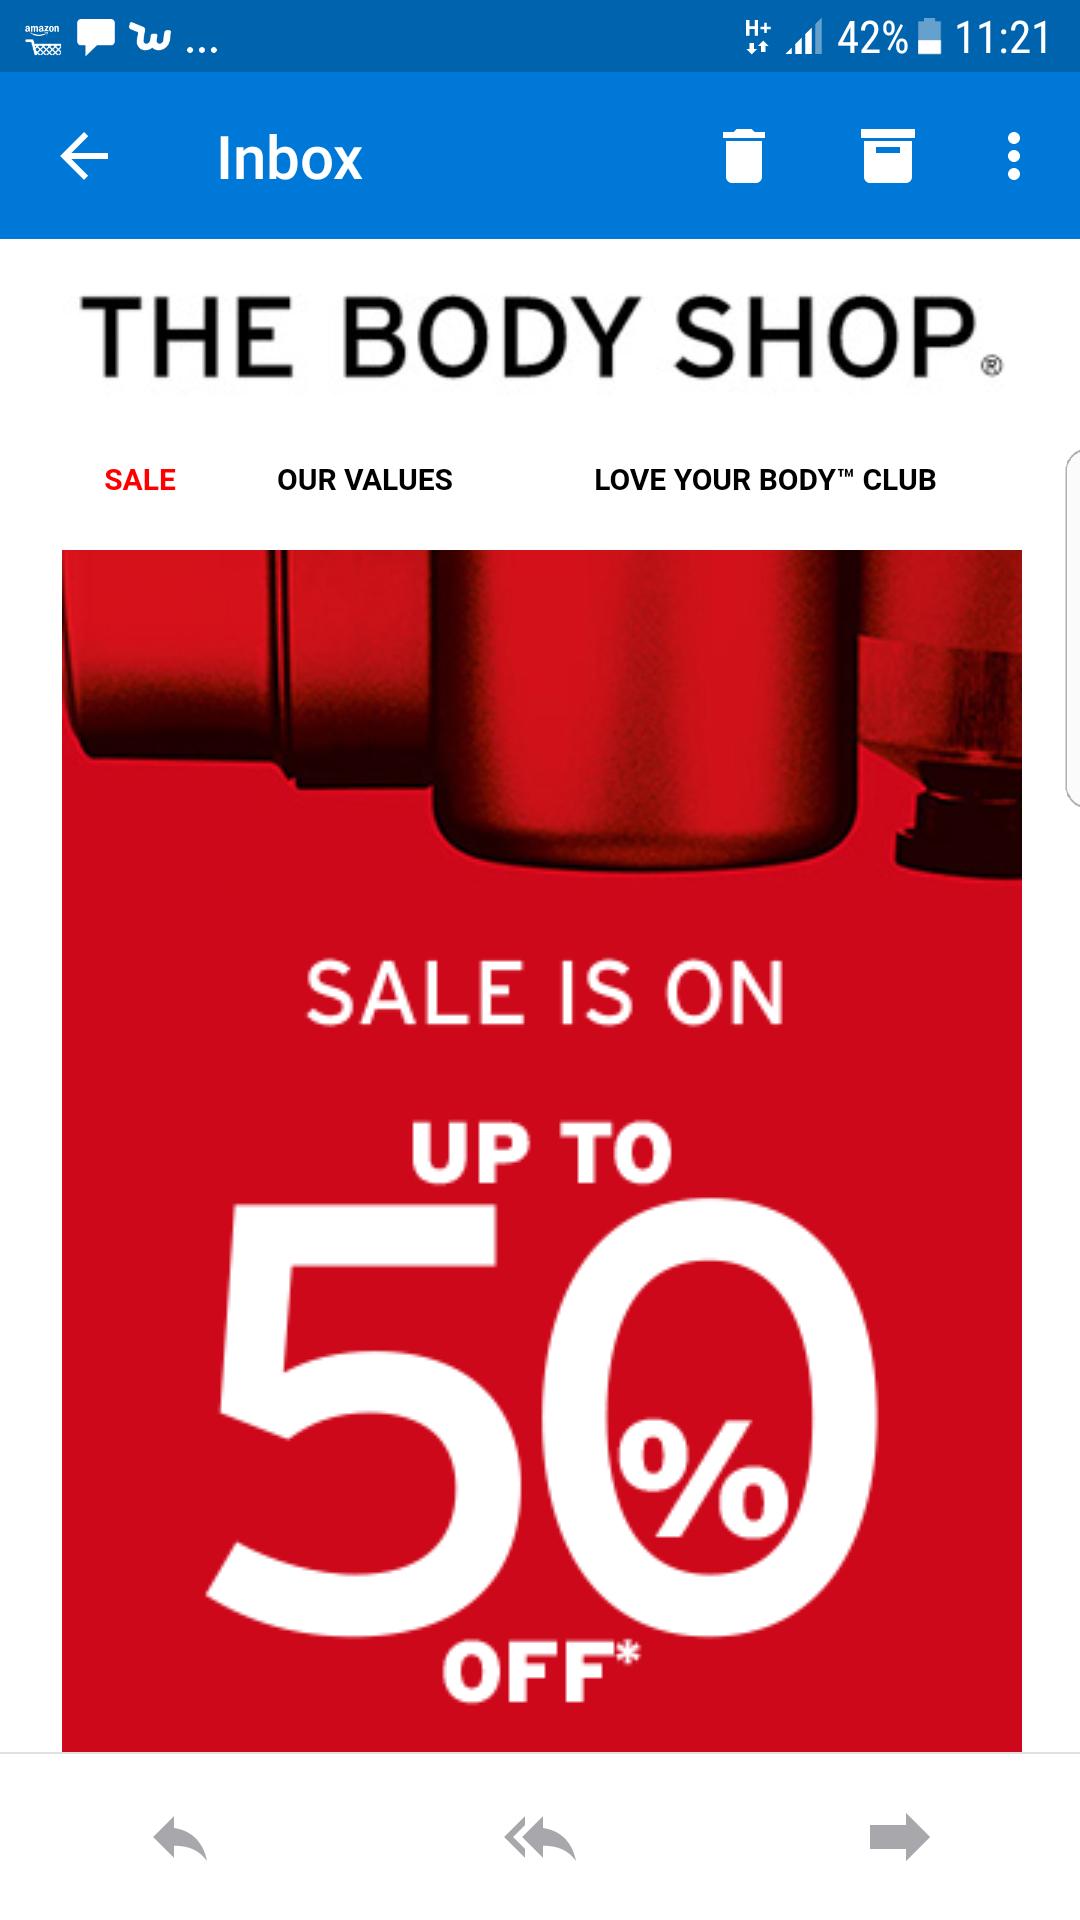 Body shop upto 50% off sale